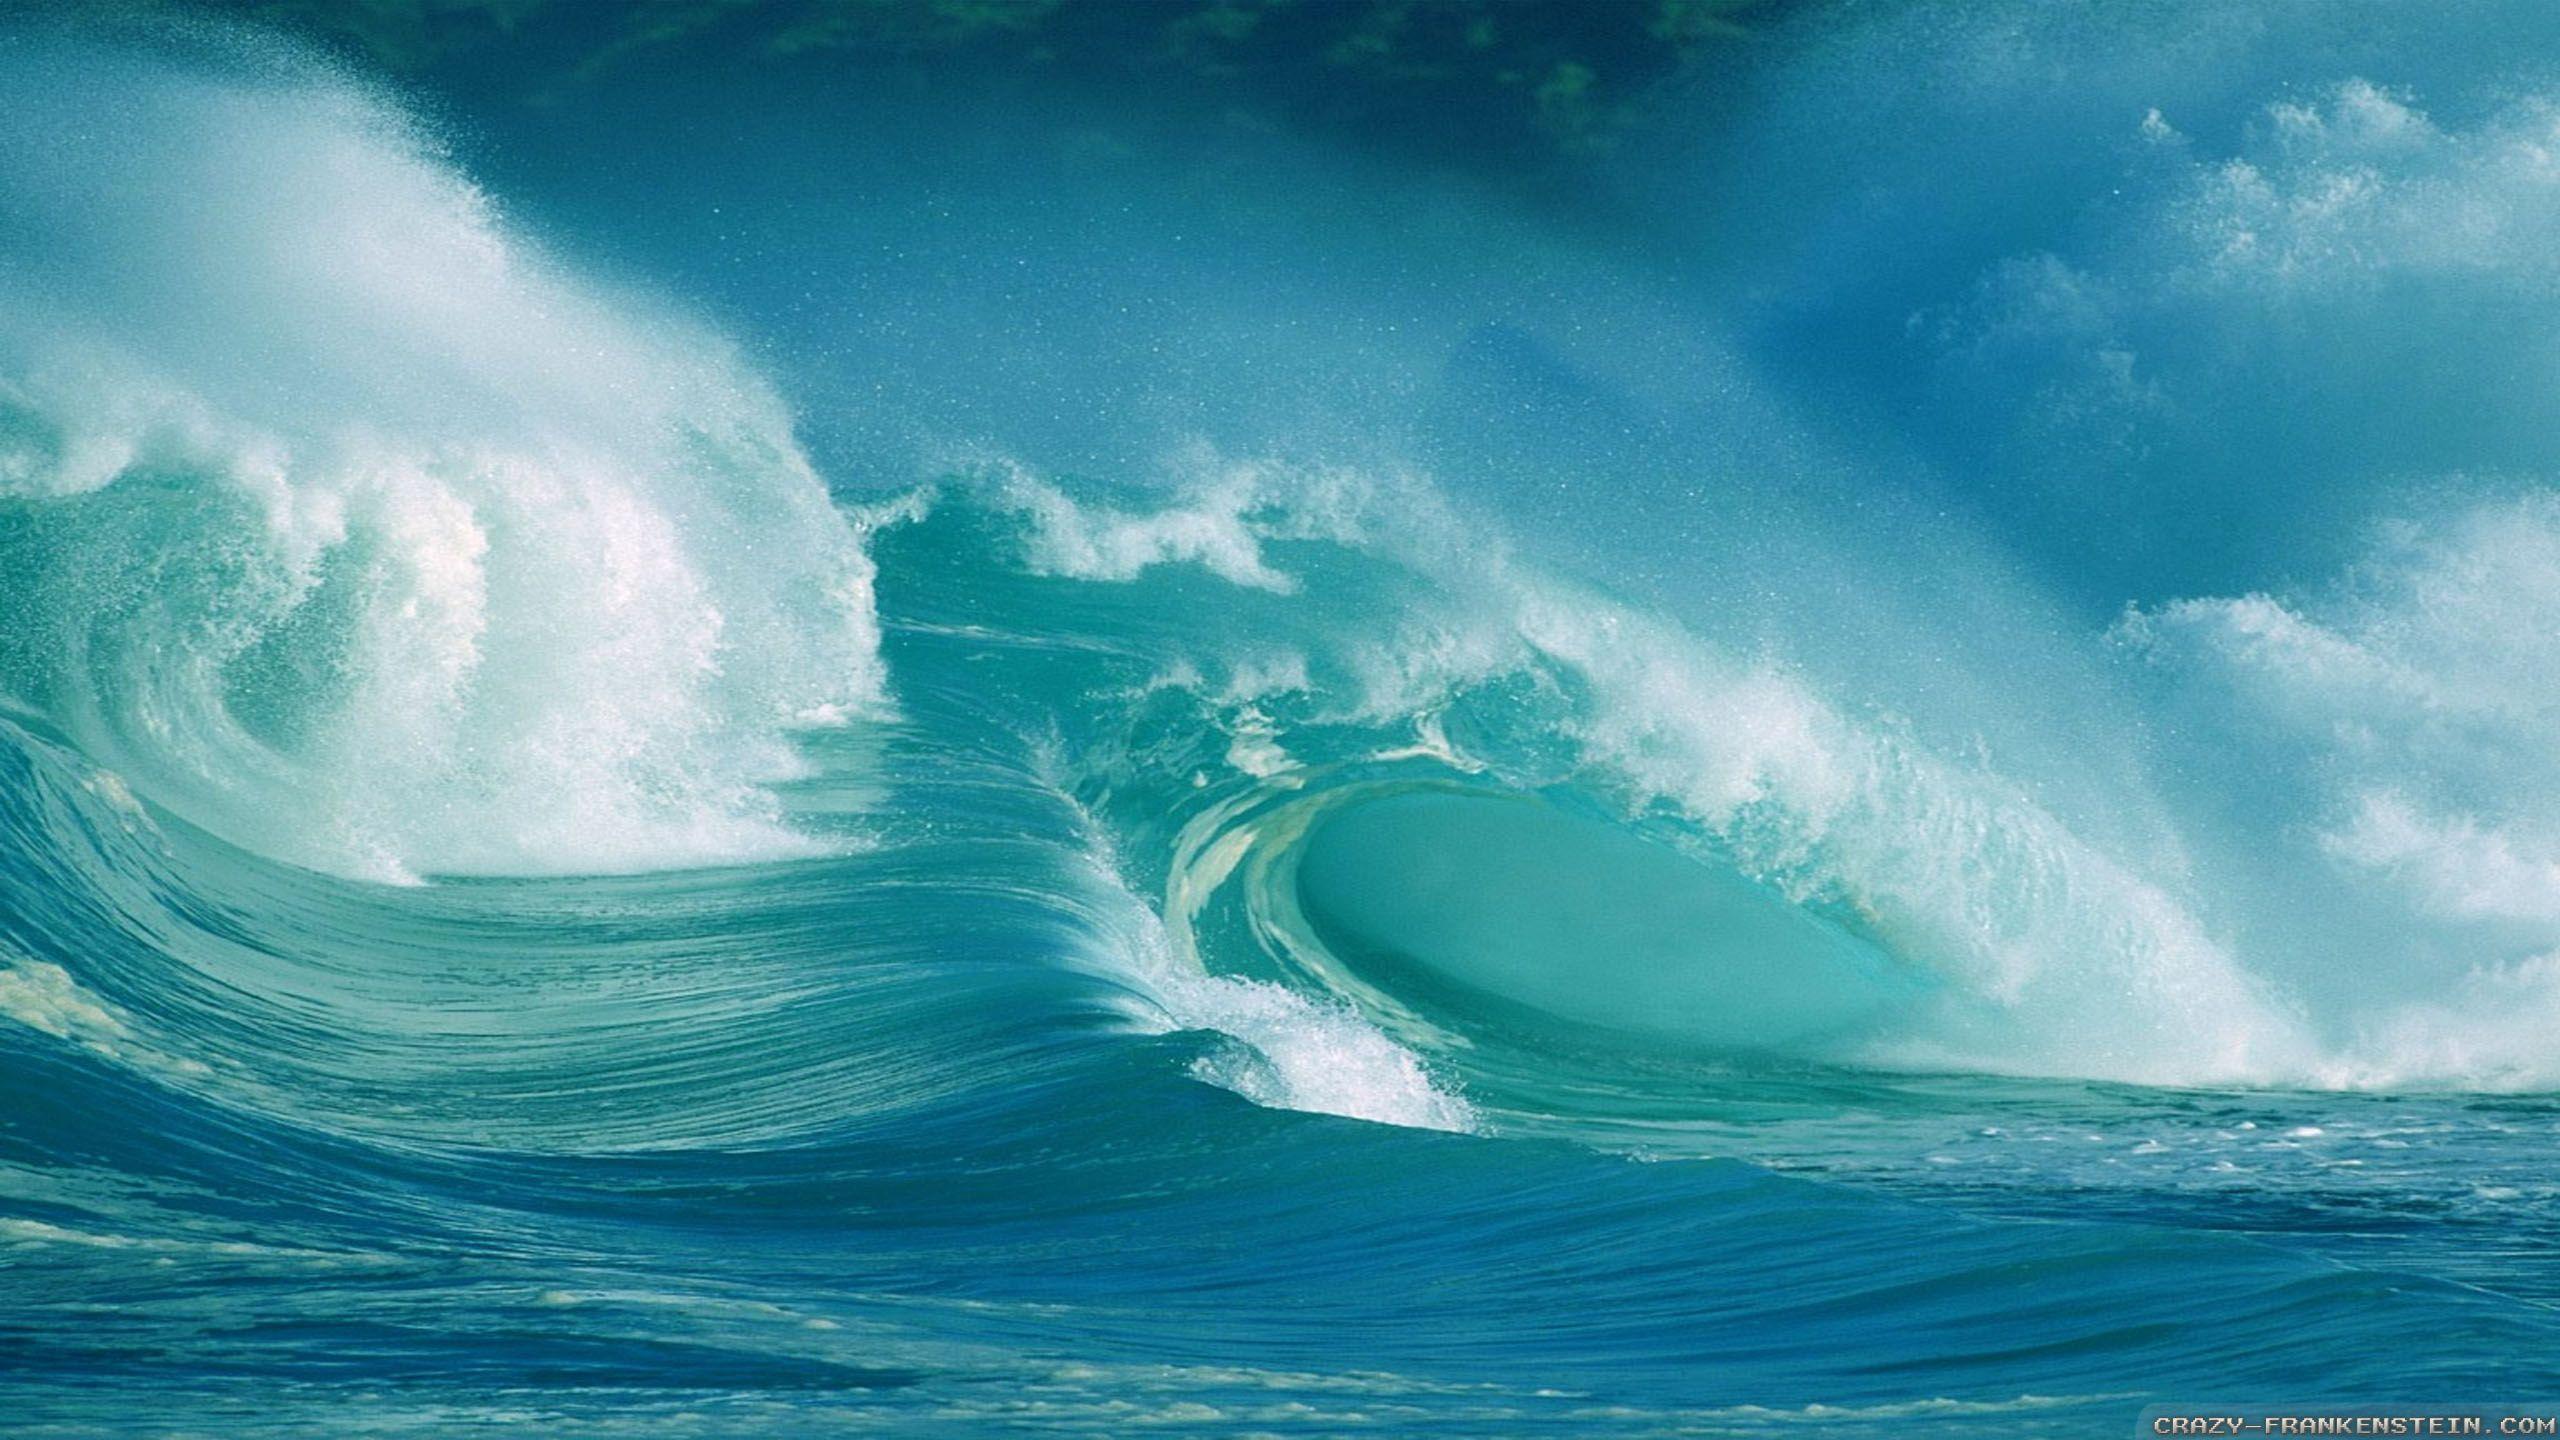 Good Wallpaper High Resolution Wave - wallpaper_waves_018  Collection_465547.jpg